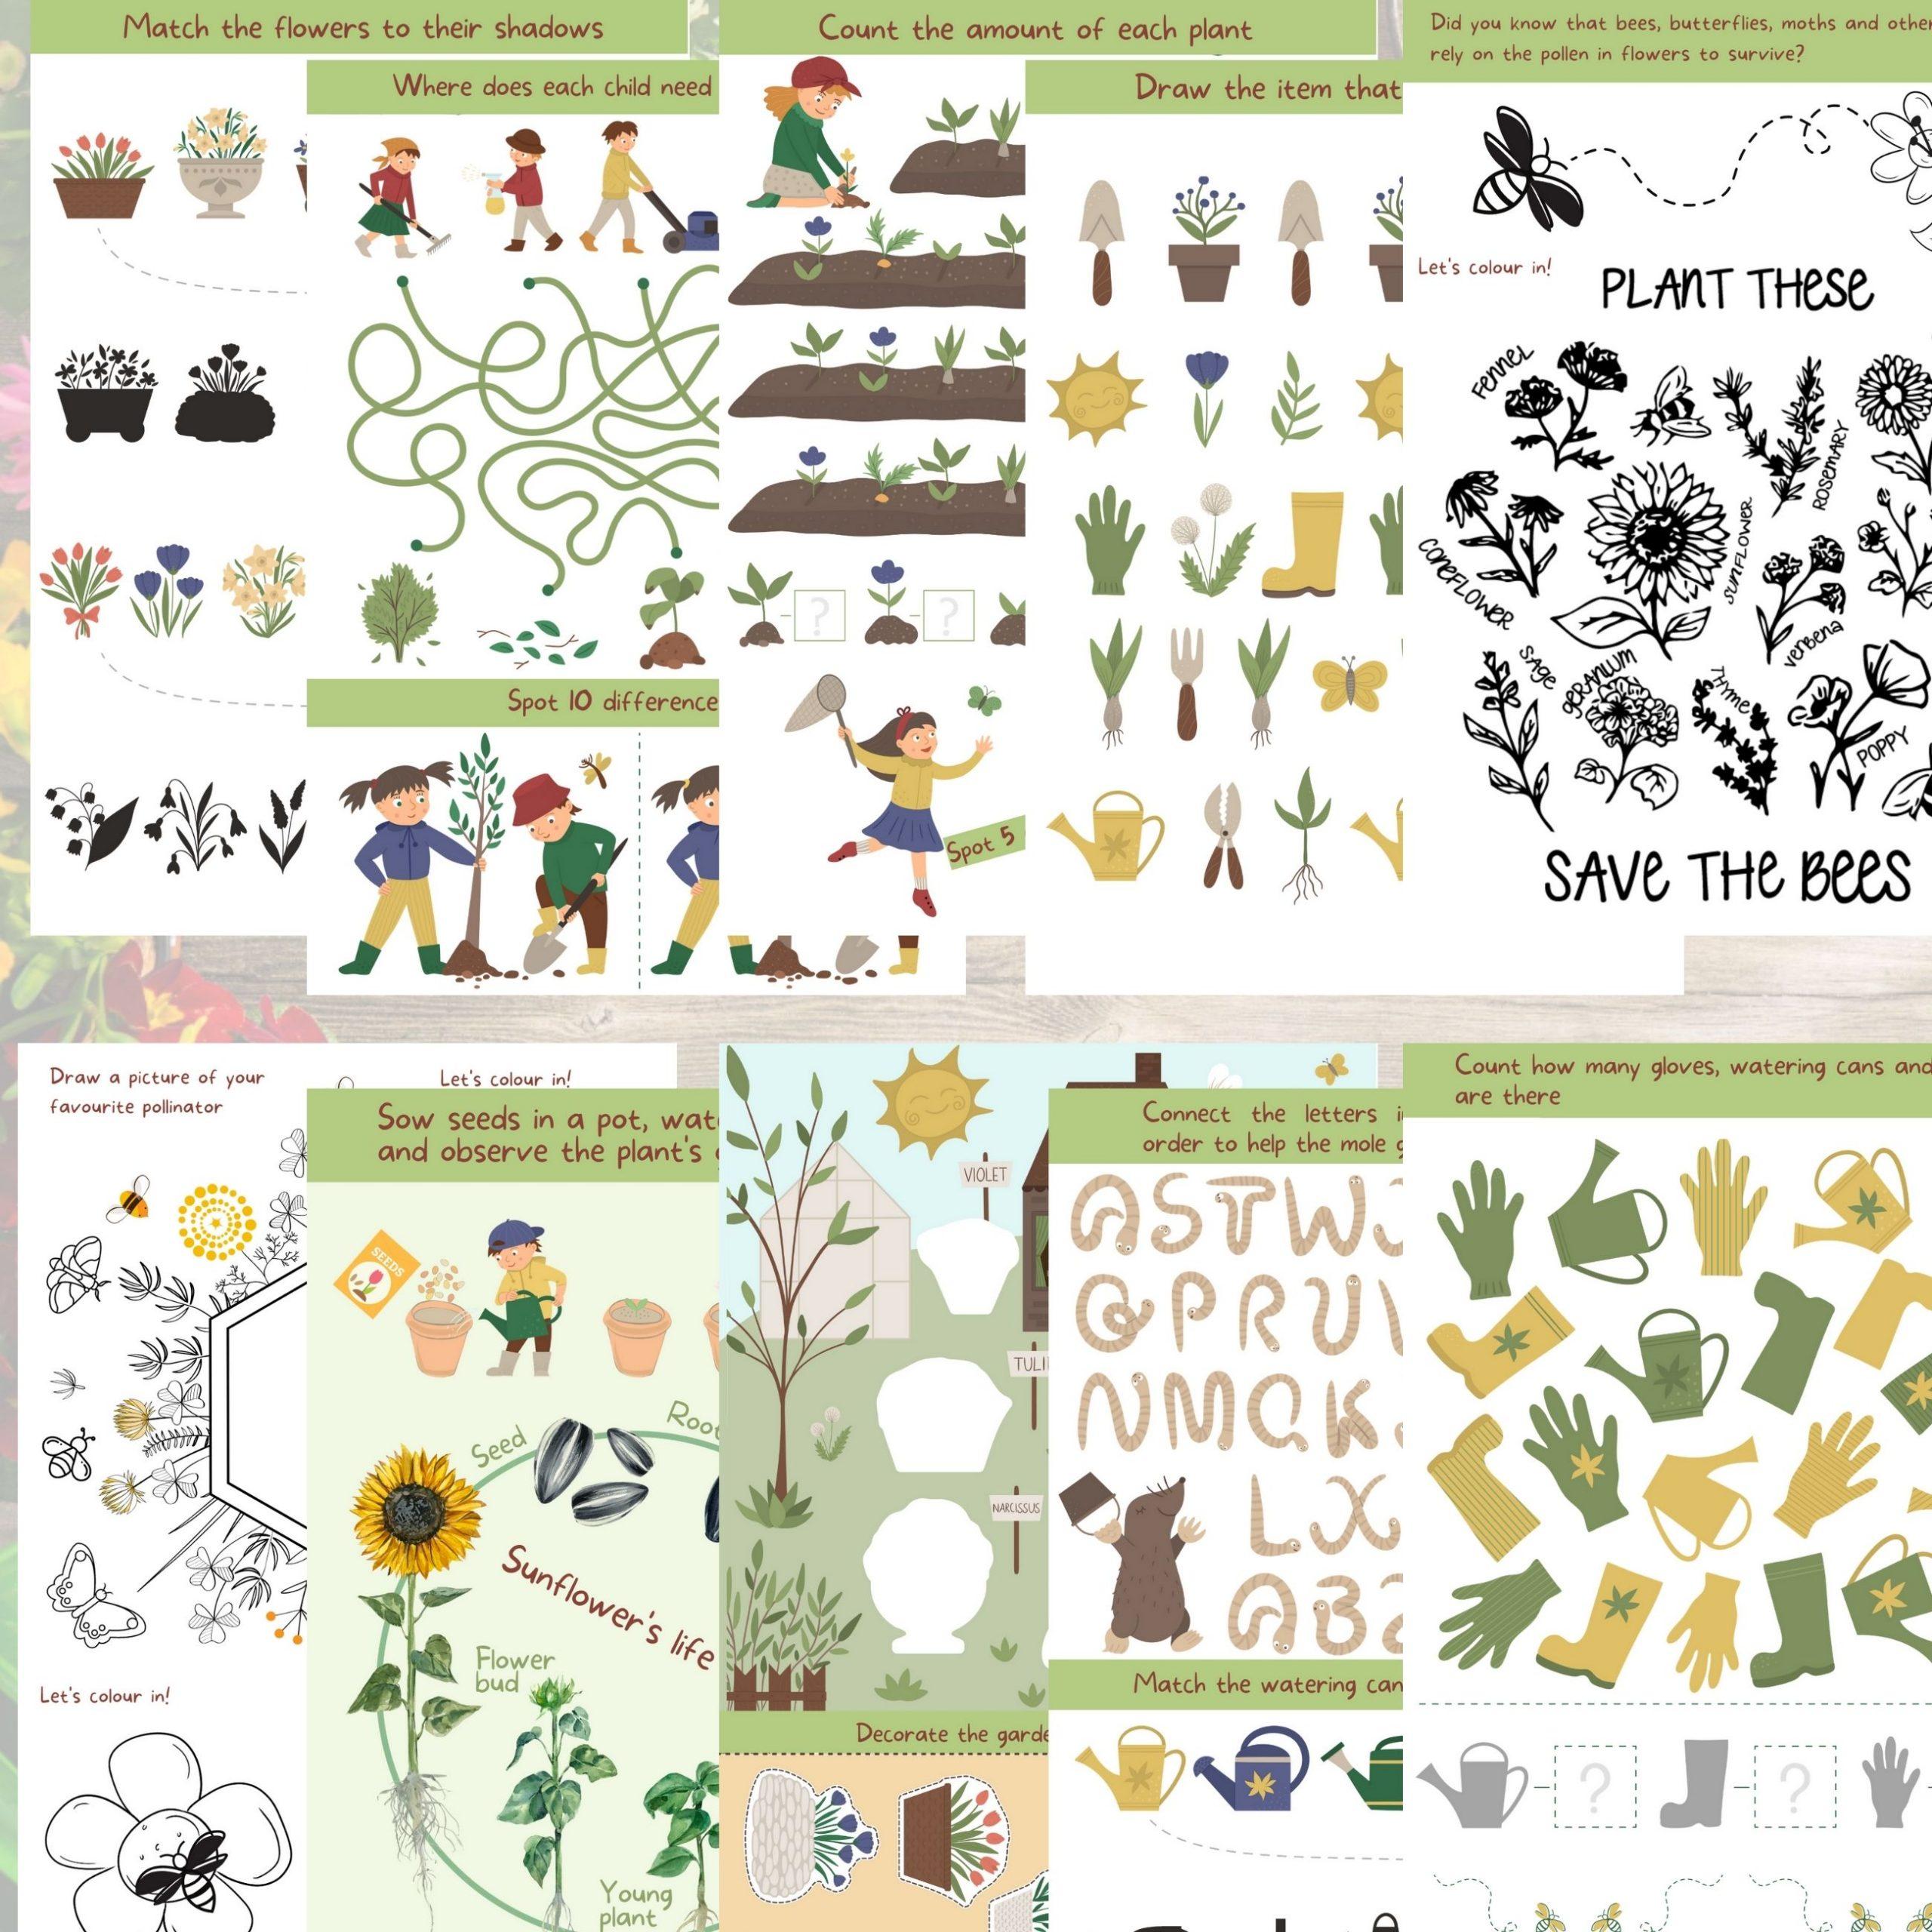 Eco friendly gardening activity booklet